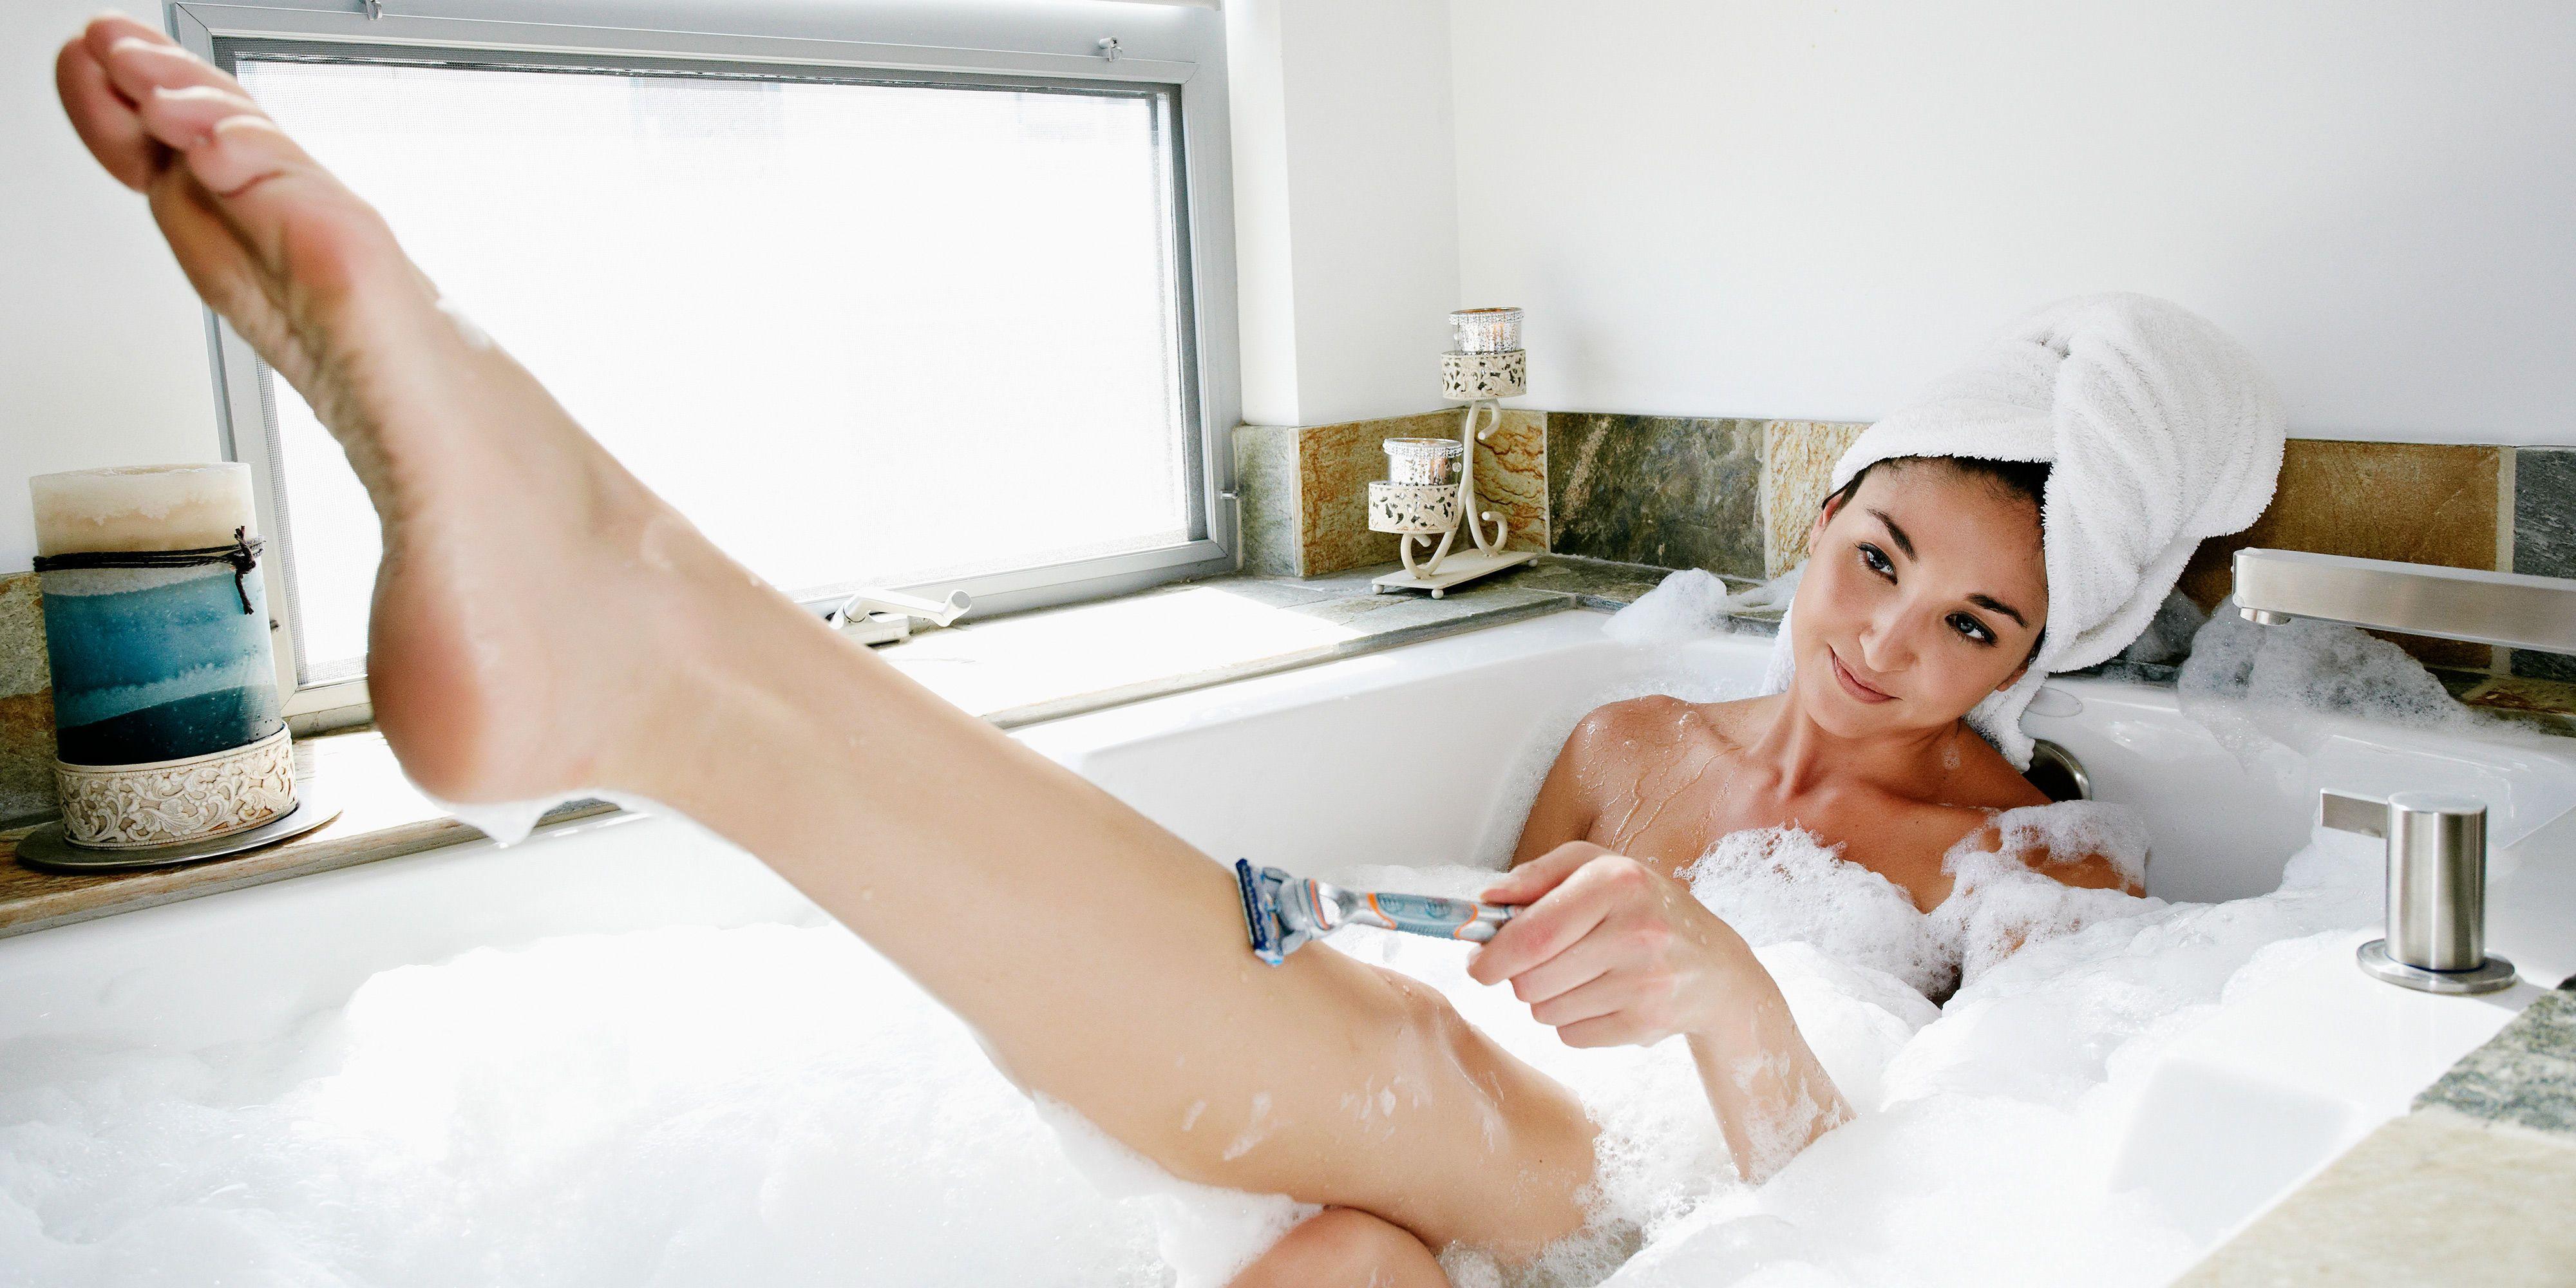 Female nurse shaved female patient